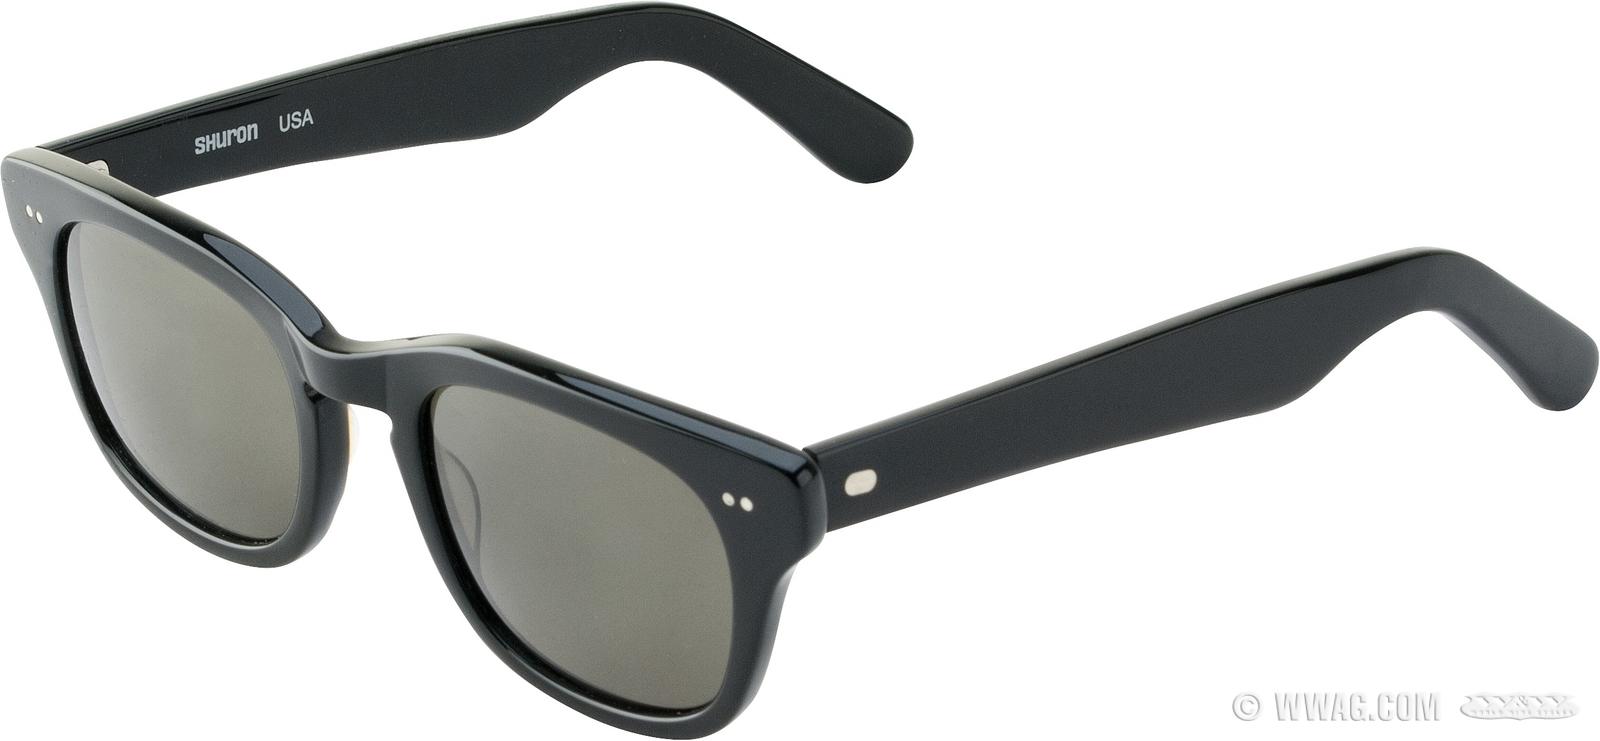 d70398baf30d W&W Cycles - Apparel and Helmets > Shuron Sidewinder Sunglasses